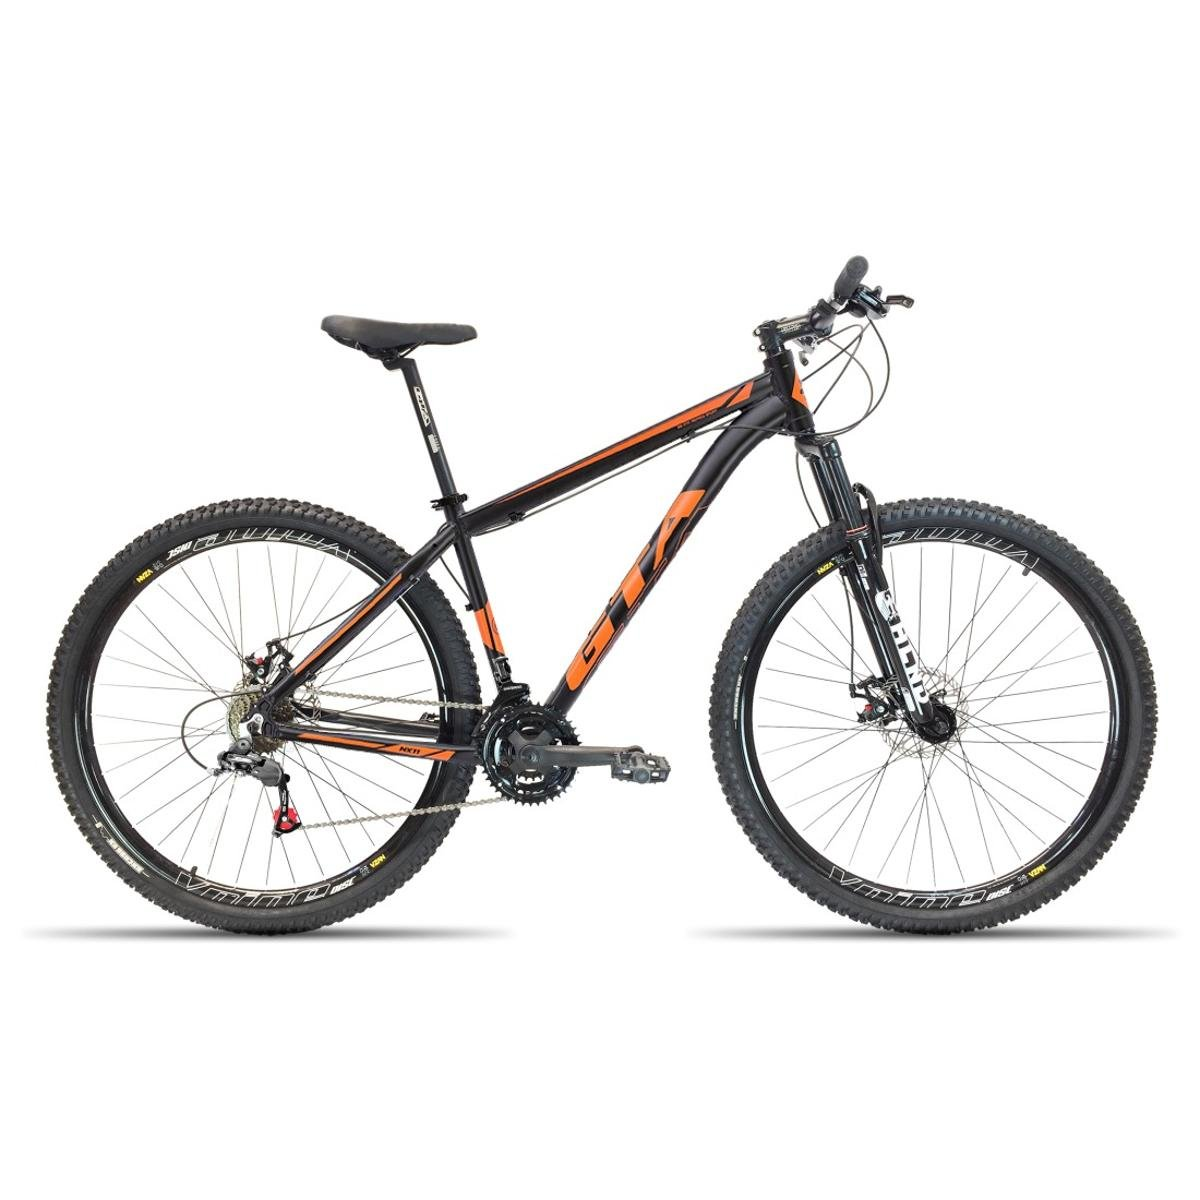 45305e582 Bicicleta Aro 29 GTA NX11 21V Cambios Shimano - Preto e Laranja - Compre  Agora